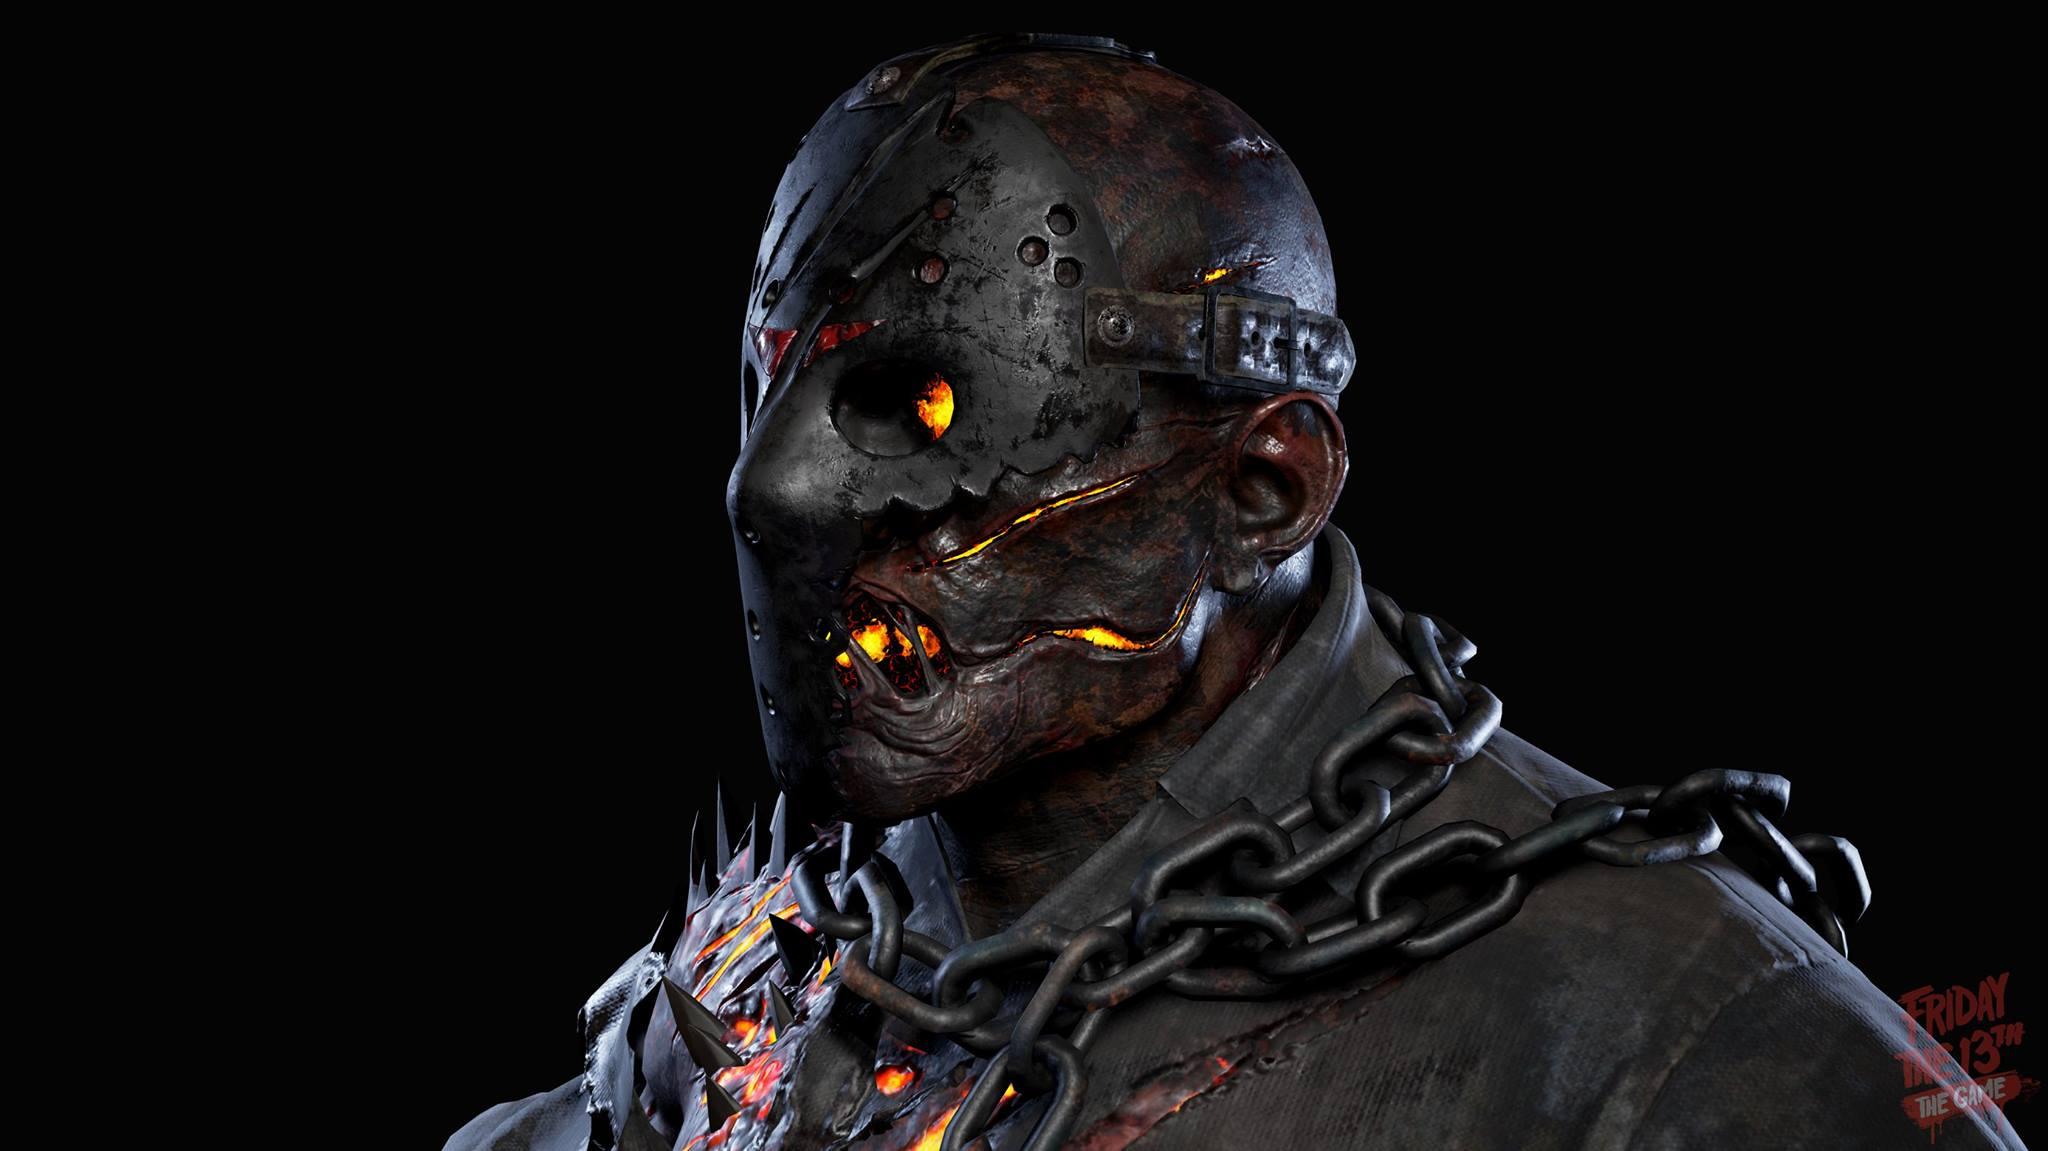 Friday The 13th The Game: Bloody Skin Savini Jason Looks ...